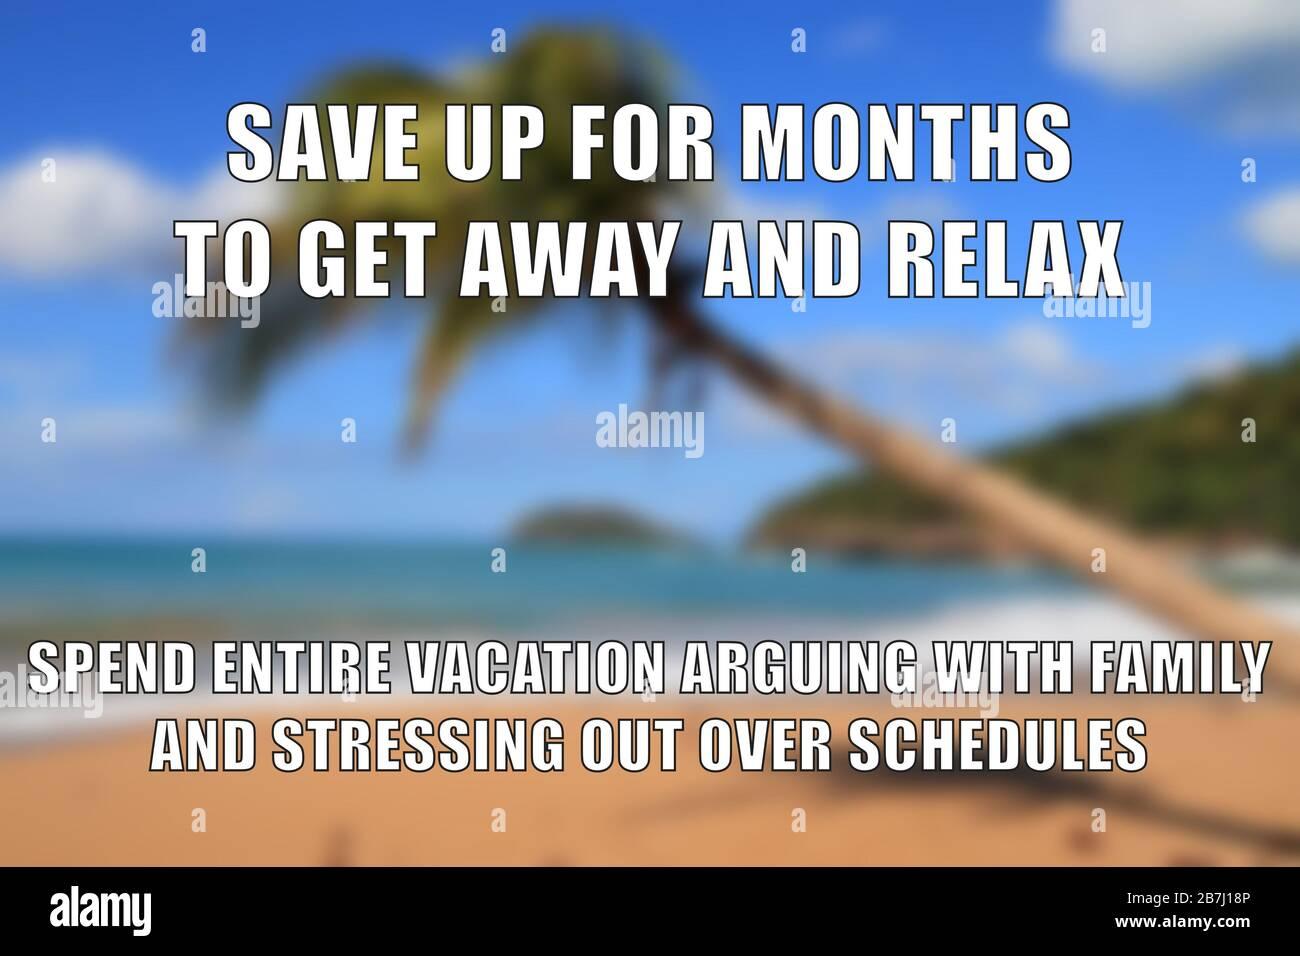 Vacation Stress Funny Meme For Social Media Sharing Beach Memes